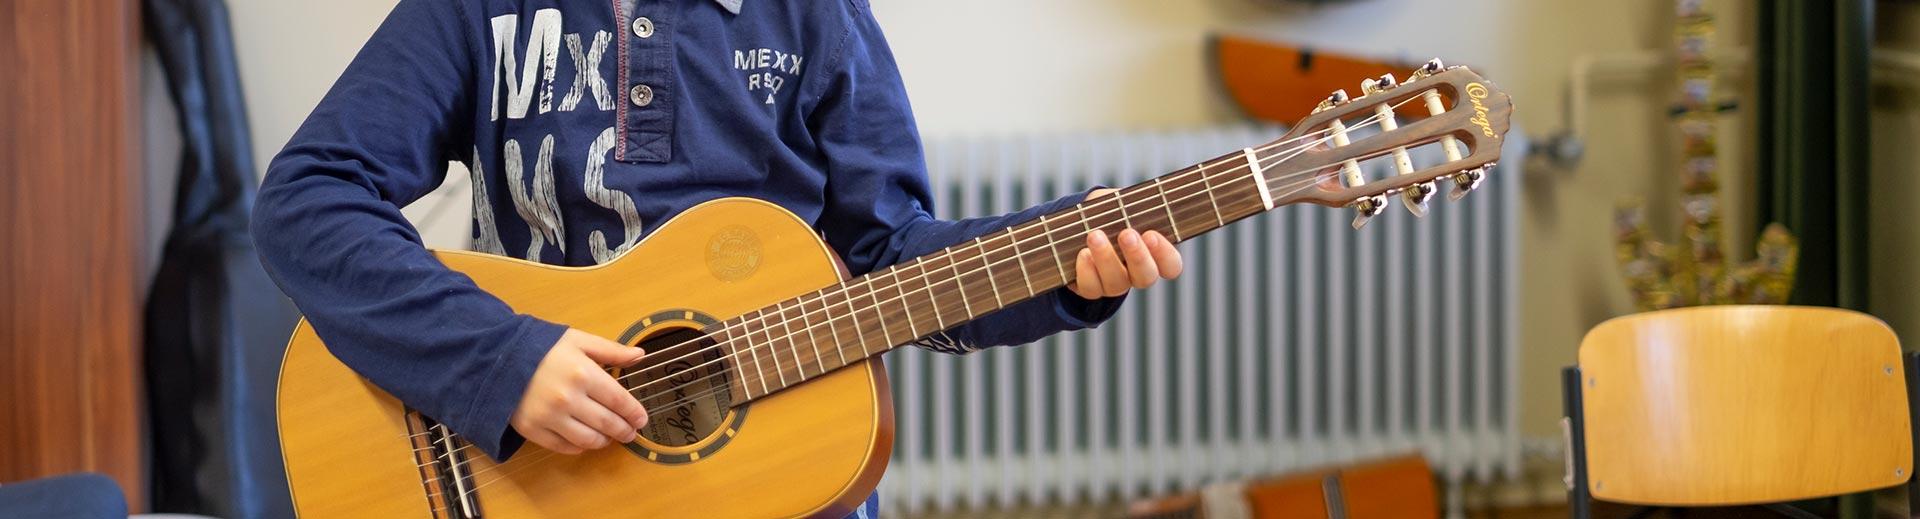 Kindergitarrenorchester – Musikschule Bayreuth